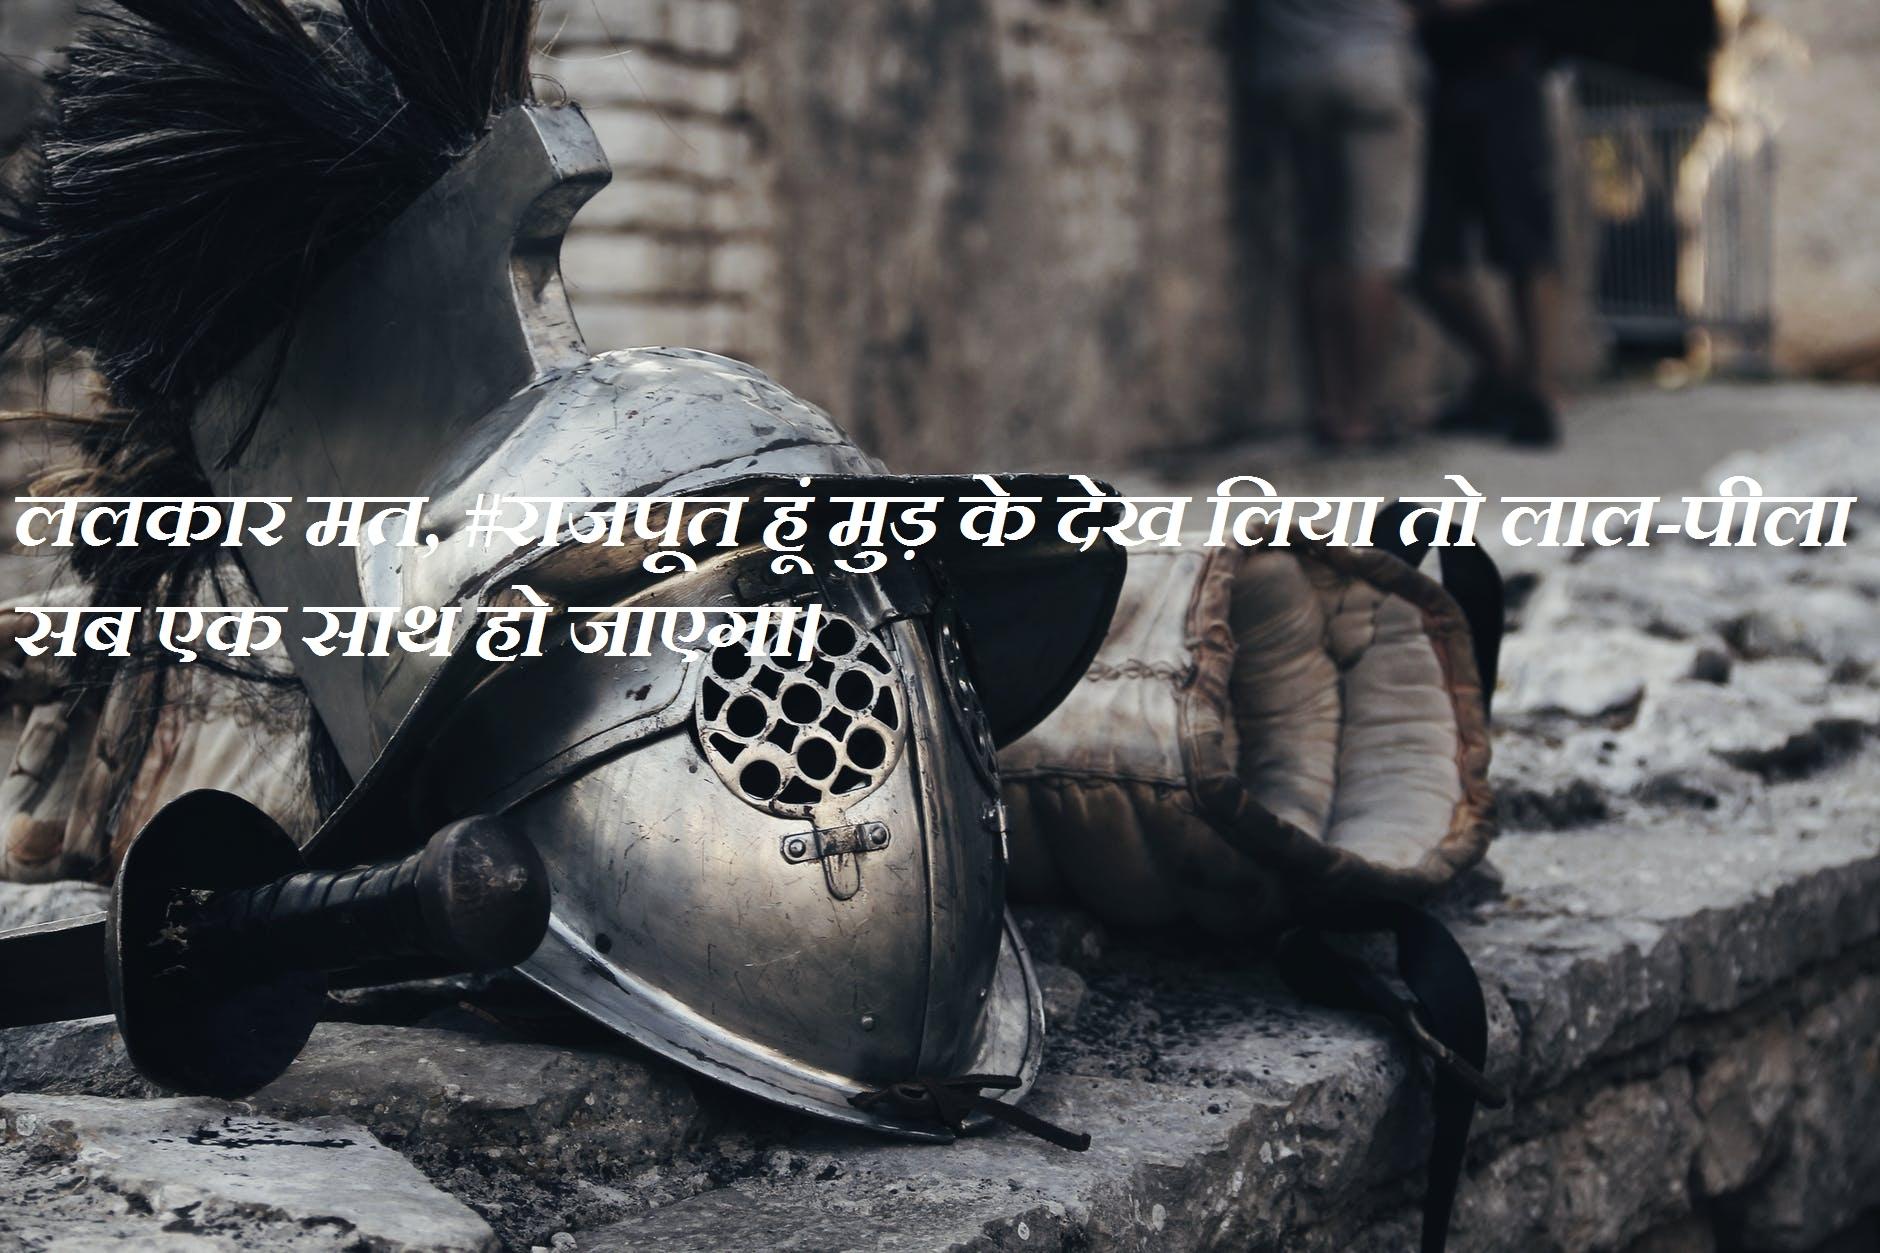 rajputana quotes in english